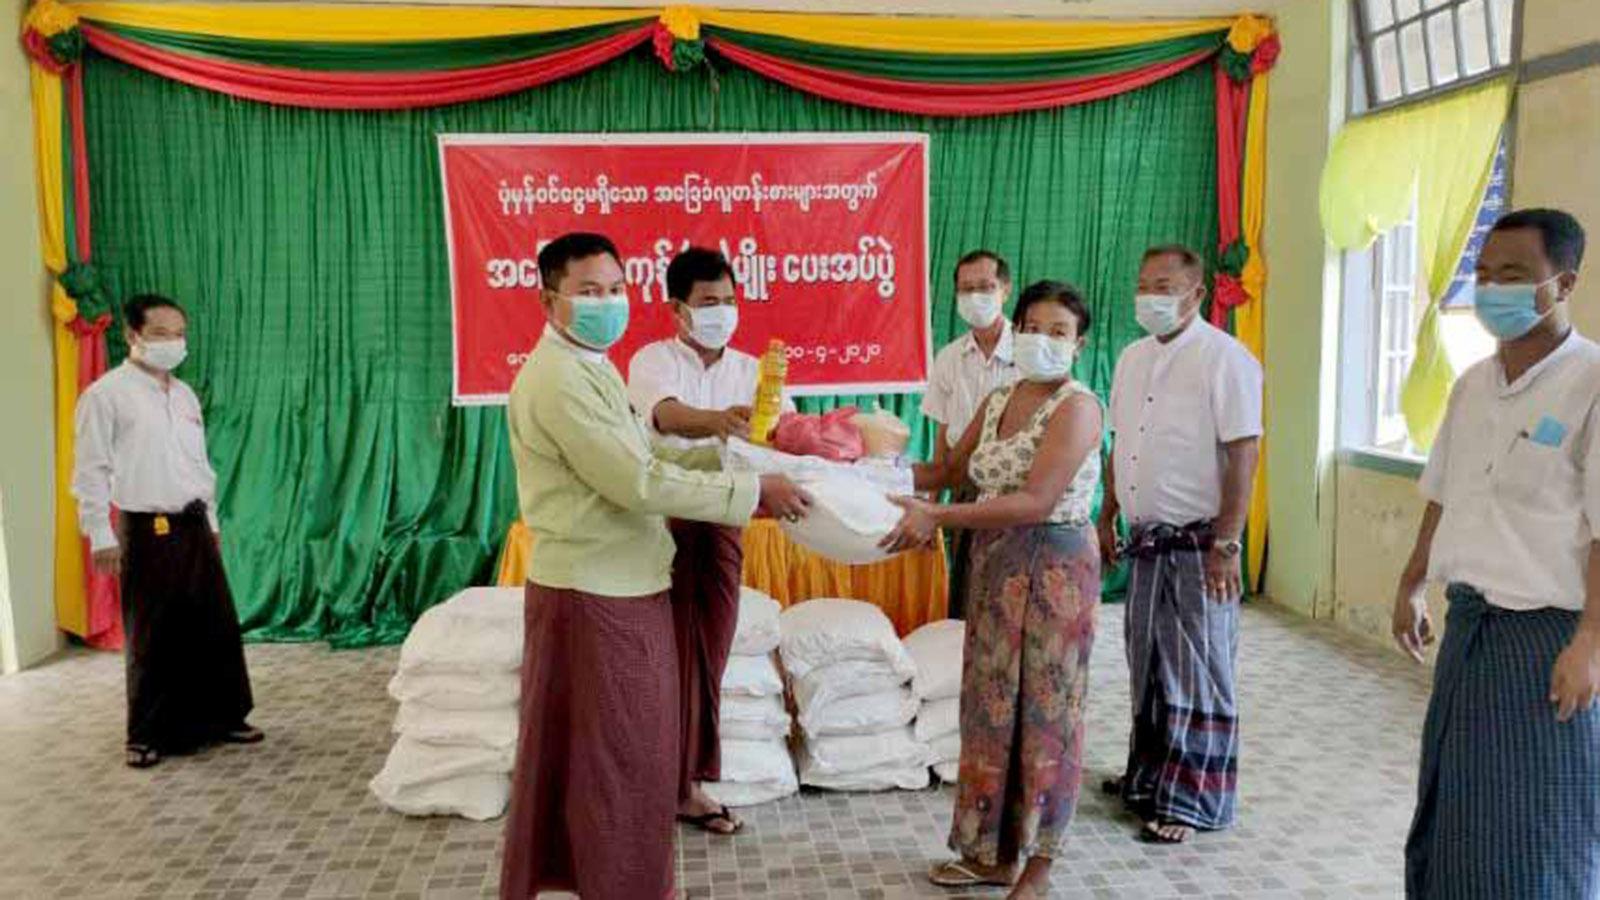 Rakhine authorities hand over food aid to local people. Photo: Tin Tun